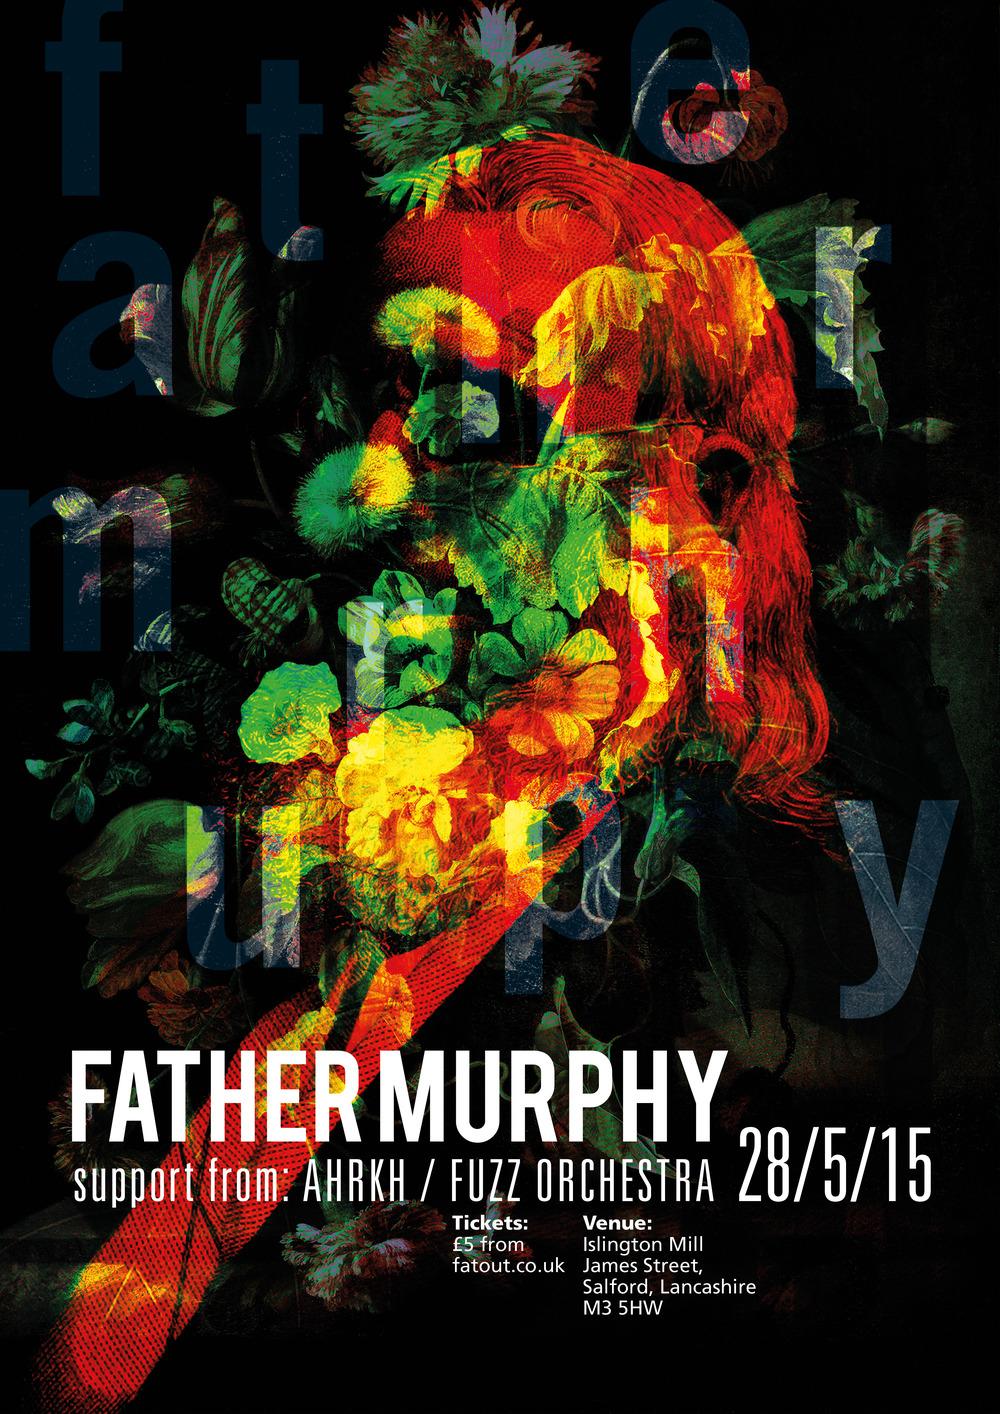 fathermurphy.jpg